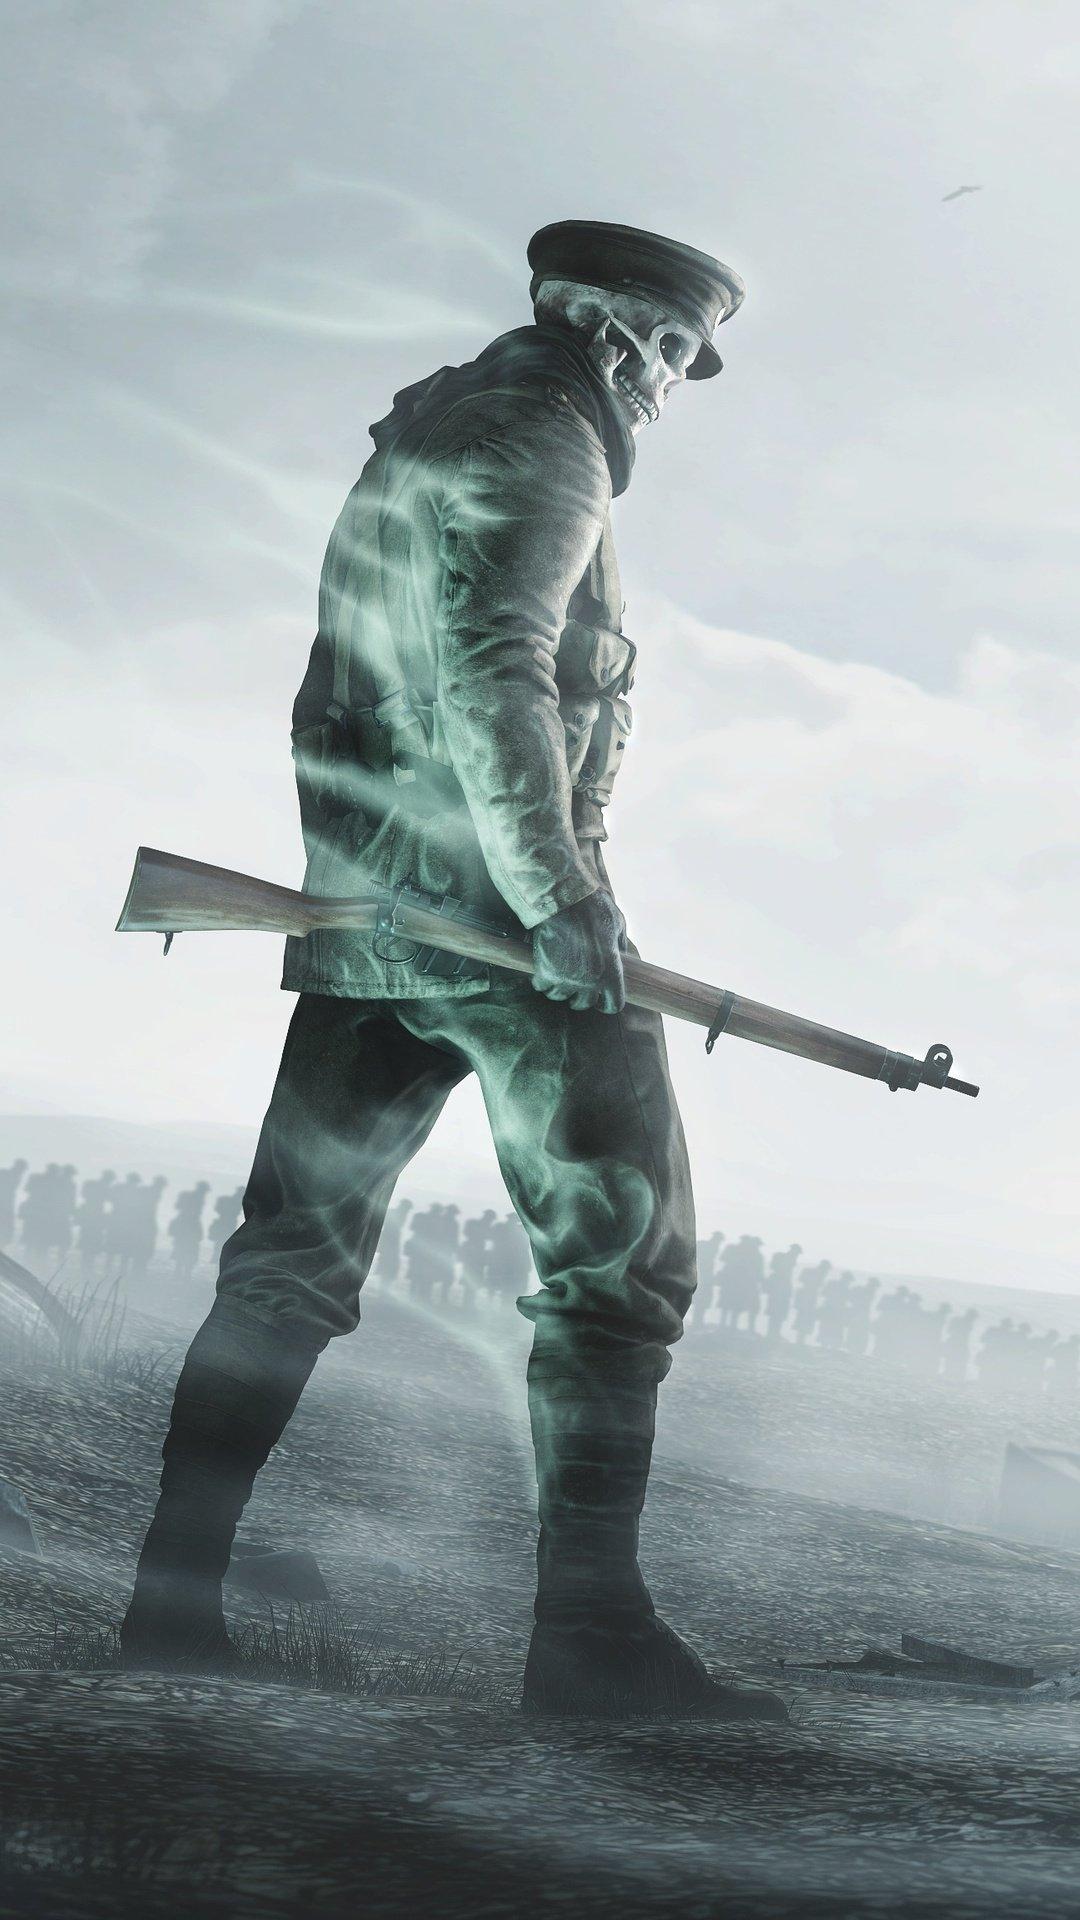 Soldier With A Gun, Zombie Skeleton wallpaper hd